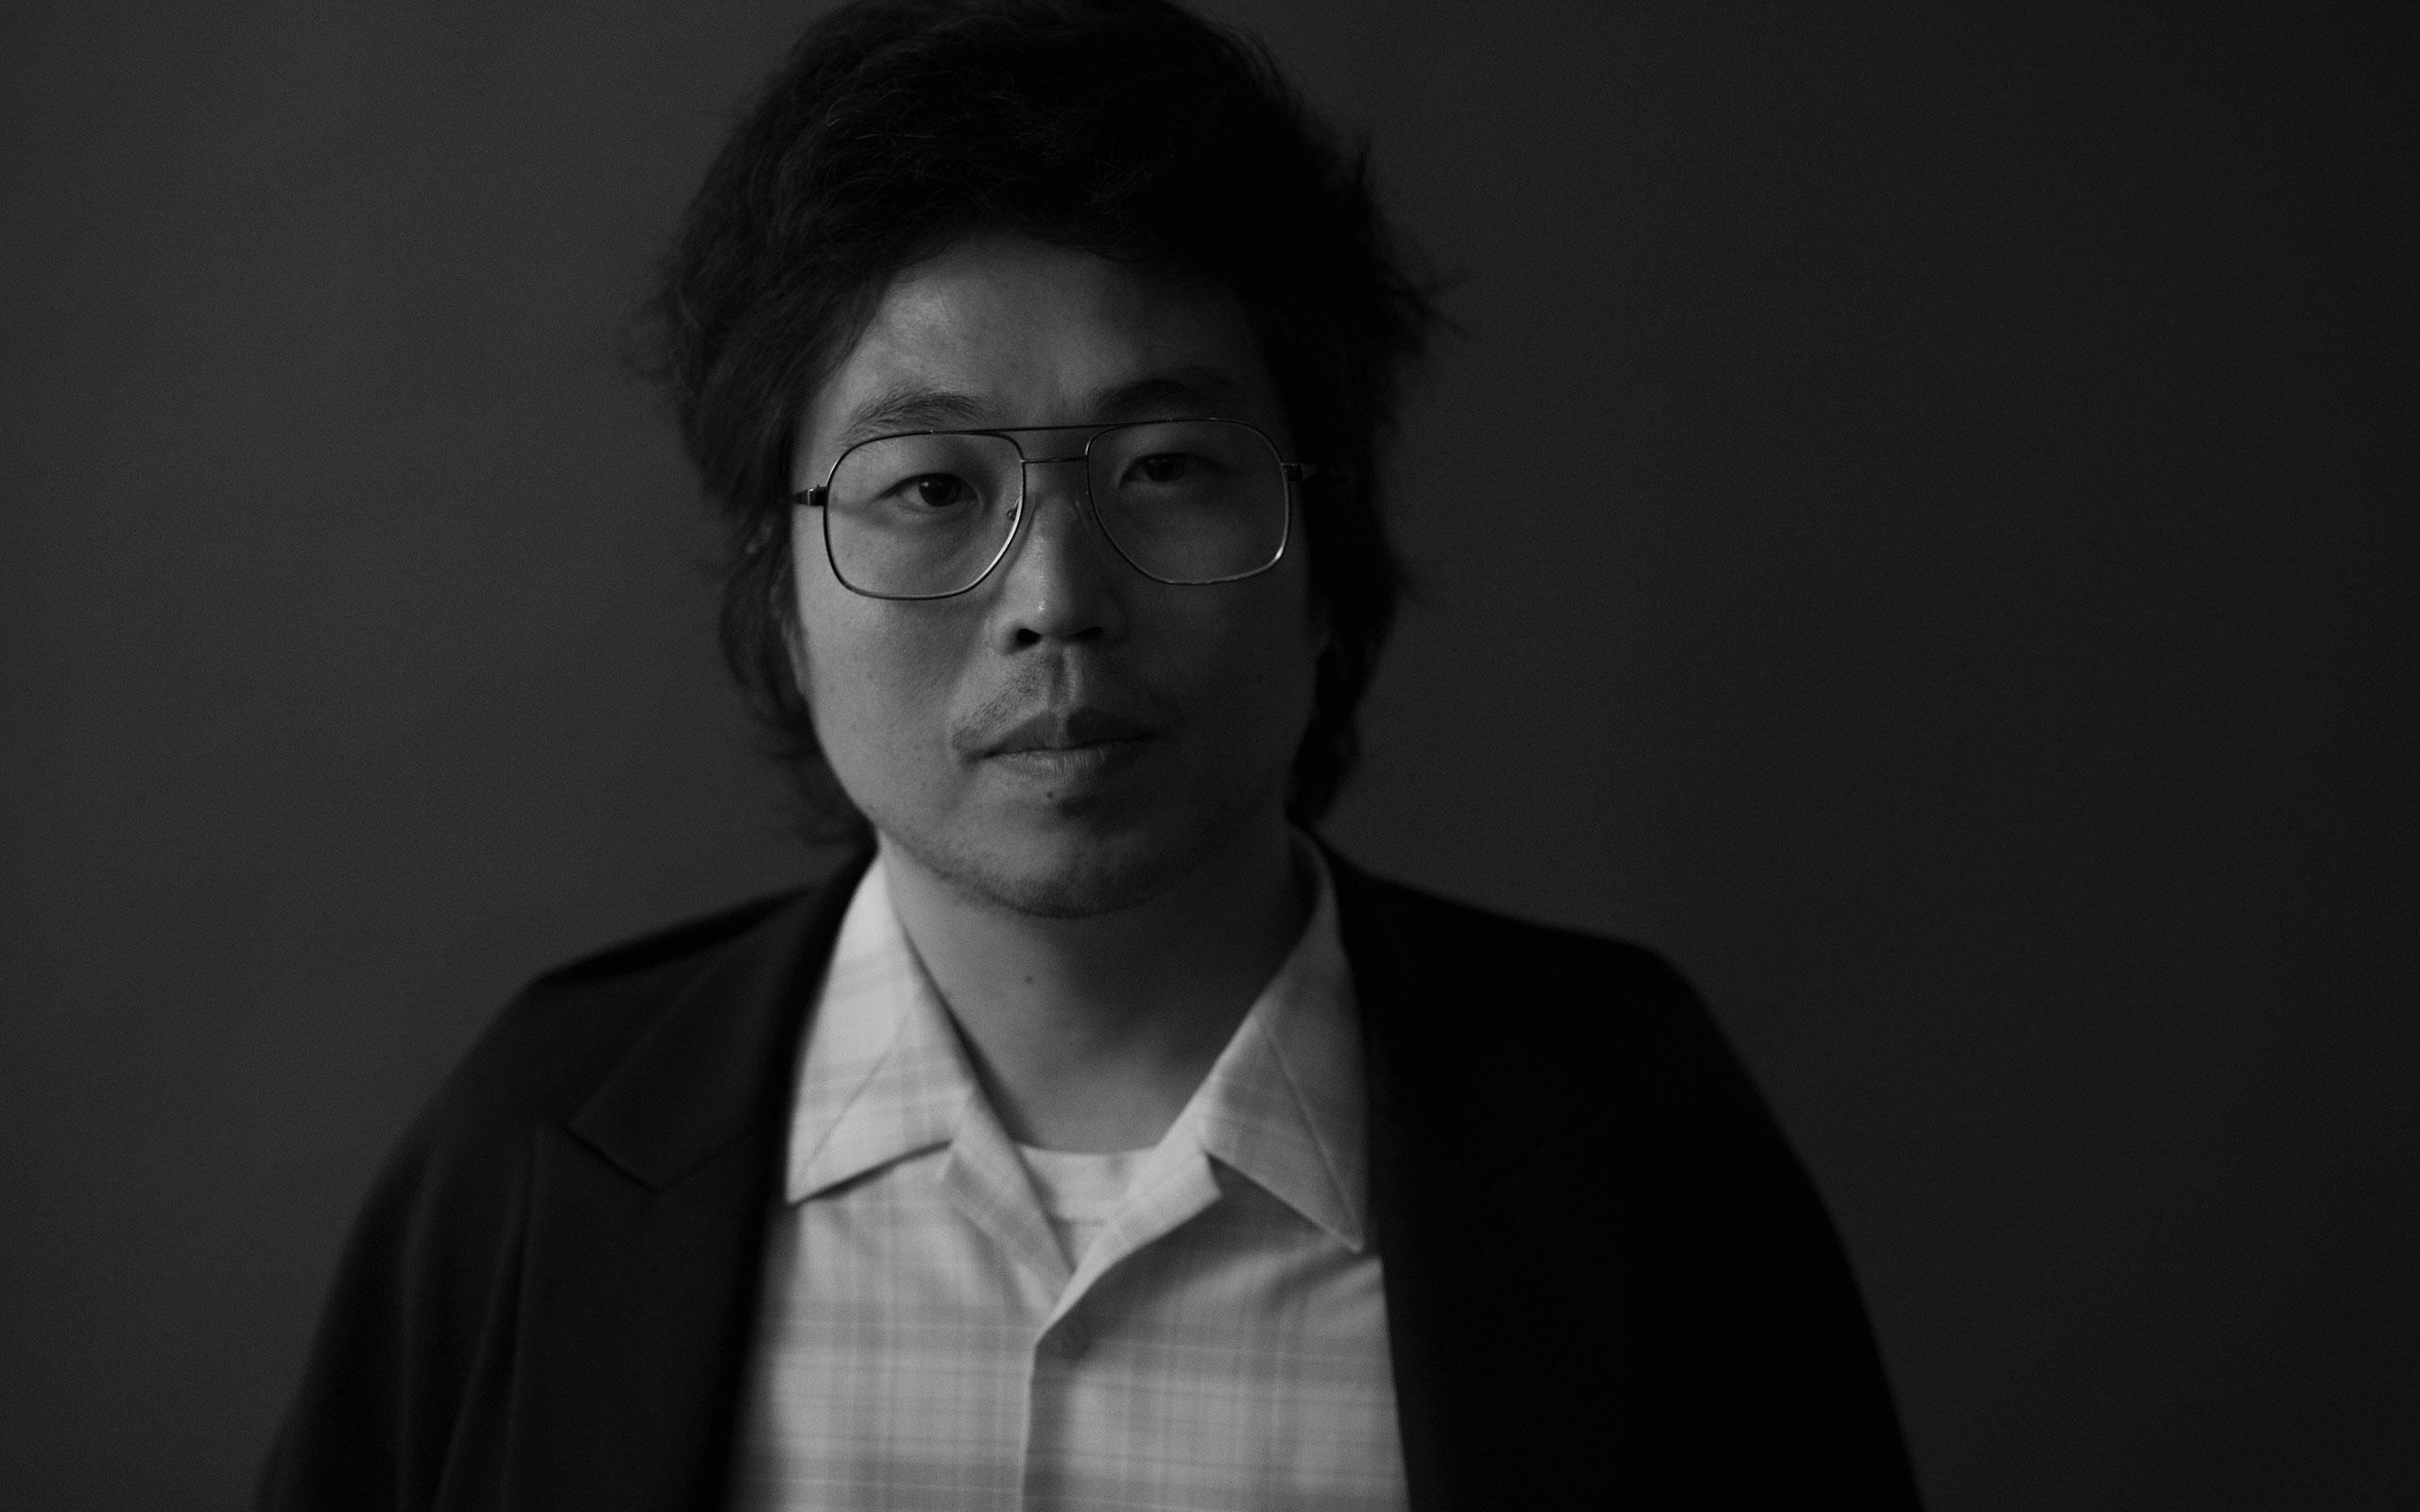 Ryuhei Oomaru